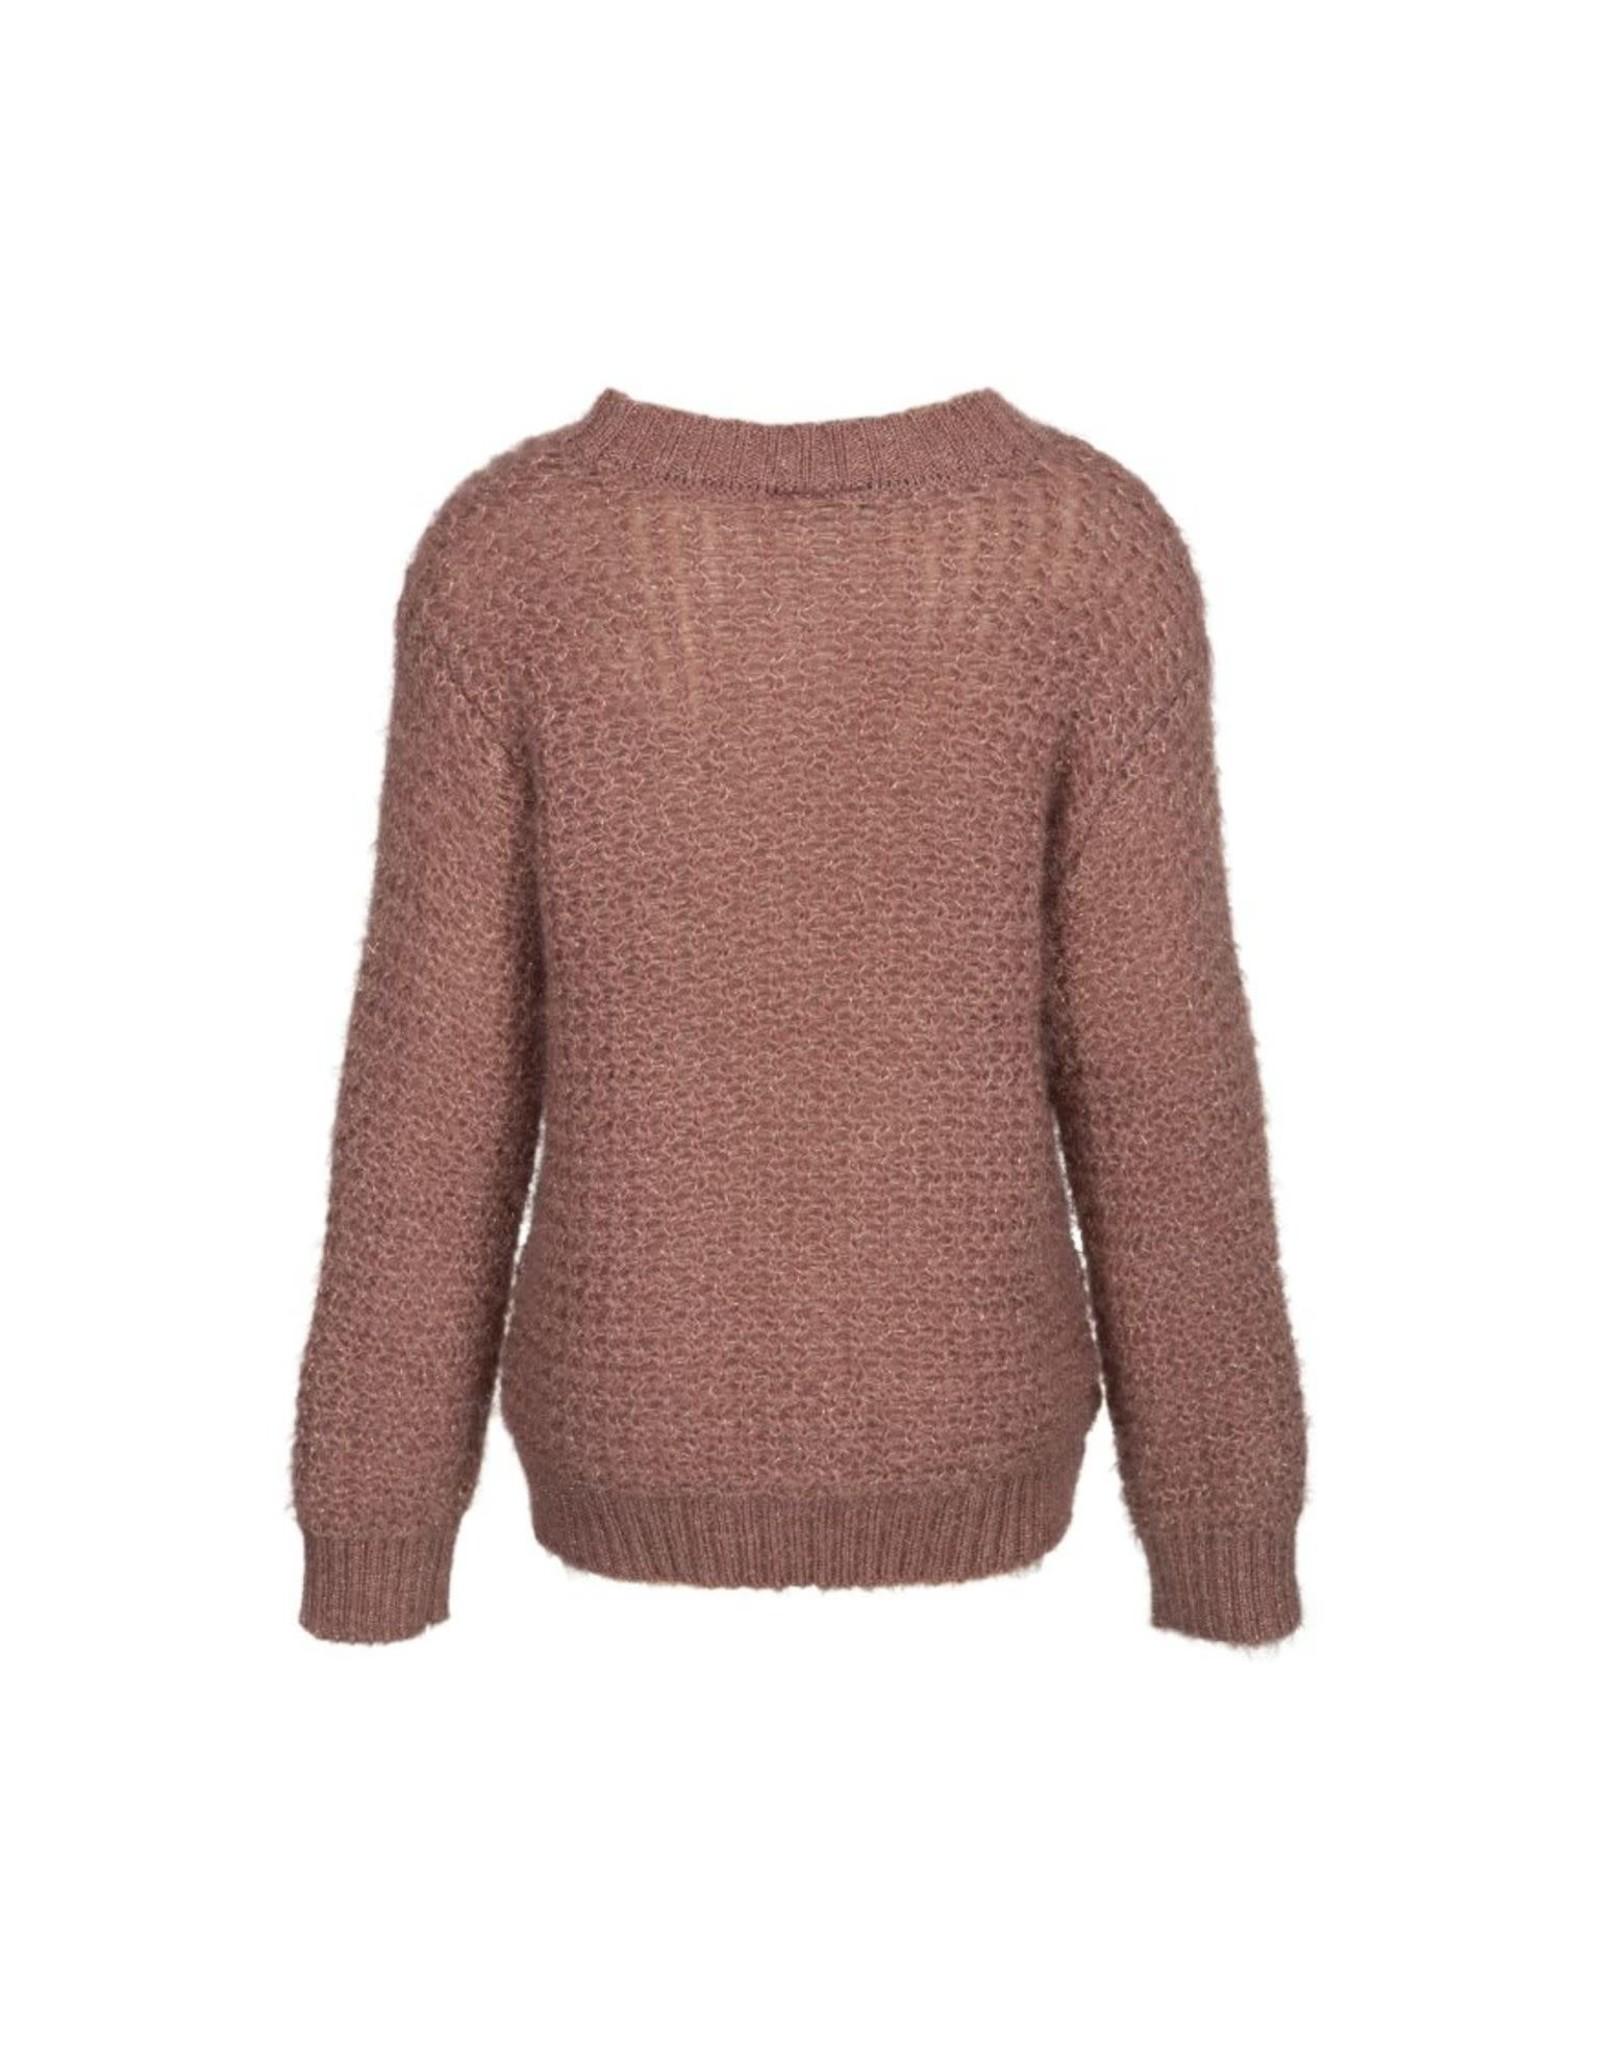 Petit by Sofie Schnoor knit roze